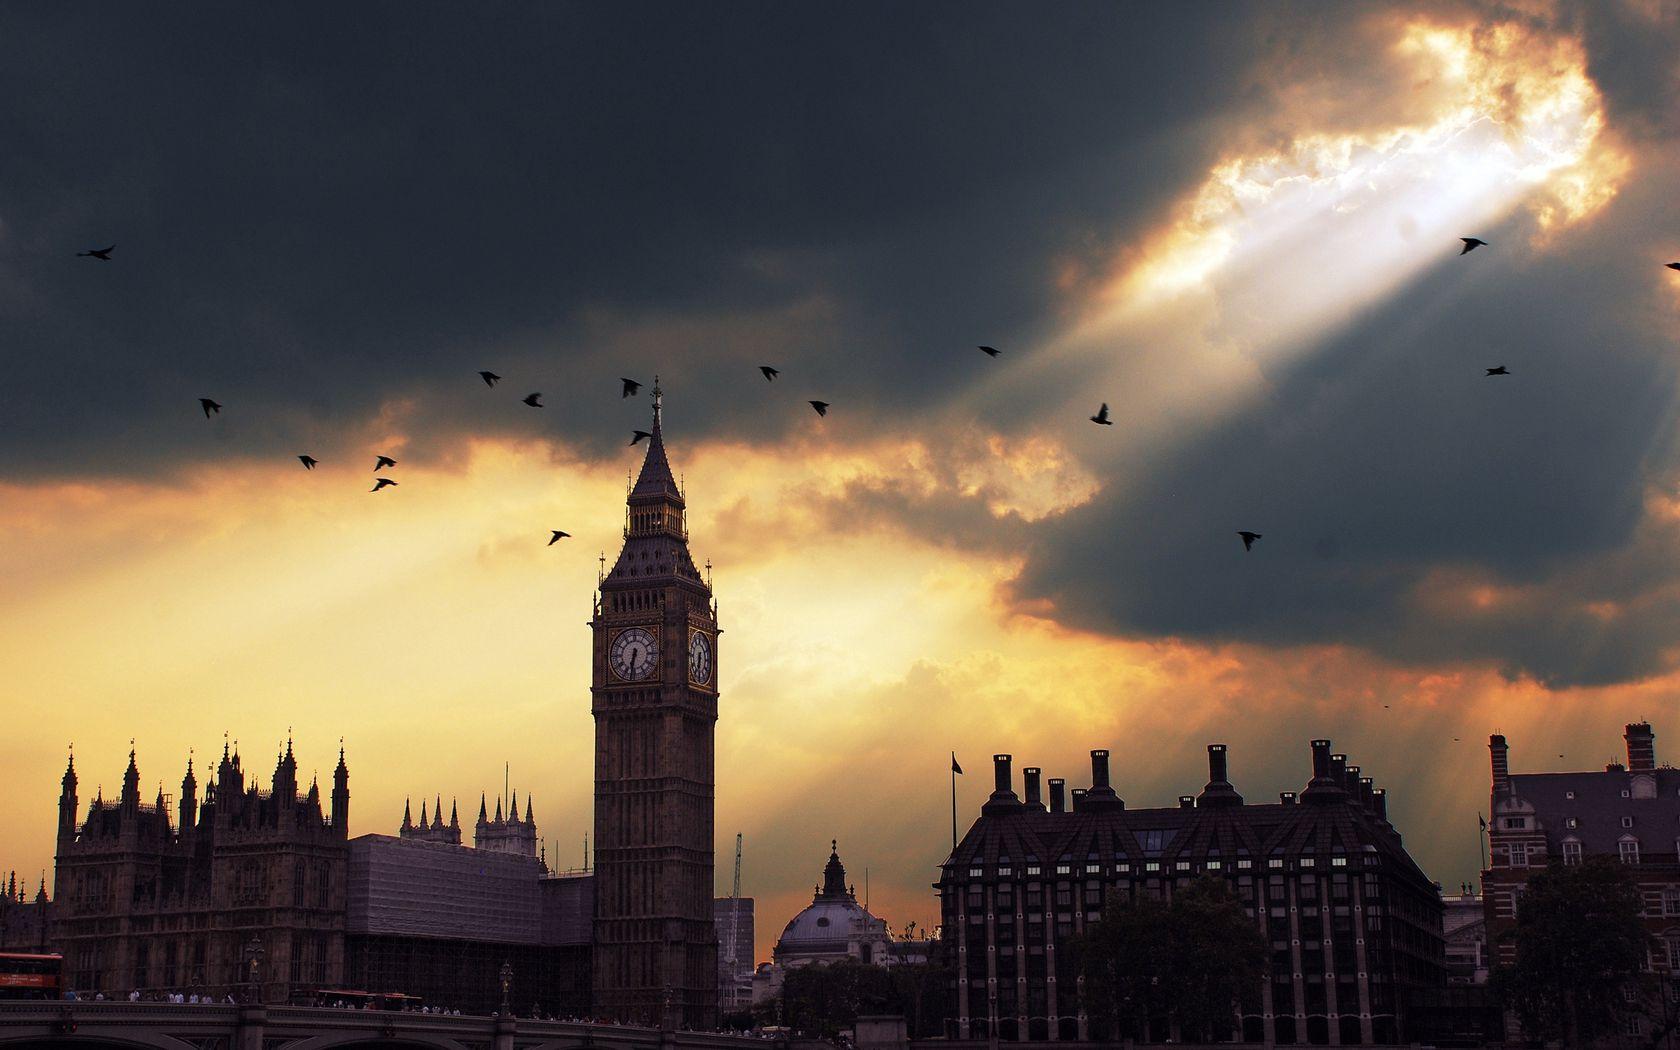 1680x1050 Wallpaper london, big ben, sunset, shadow, sky